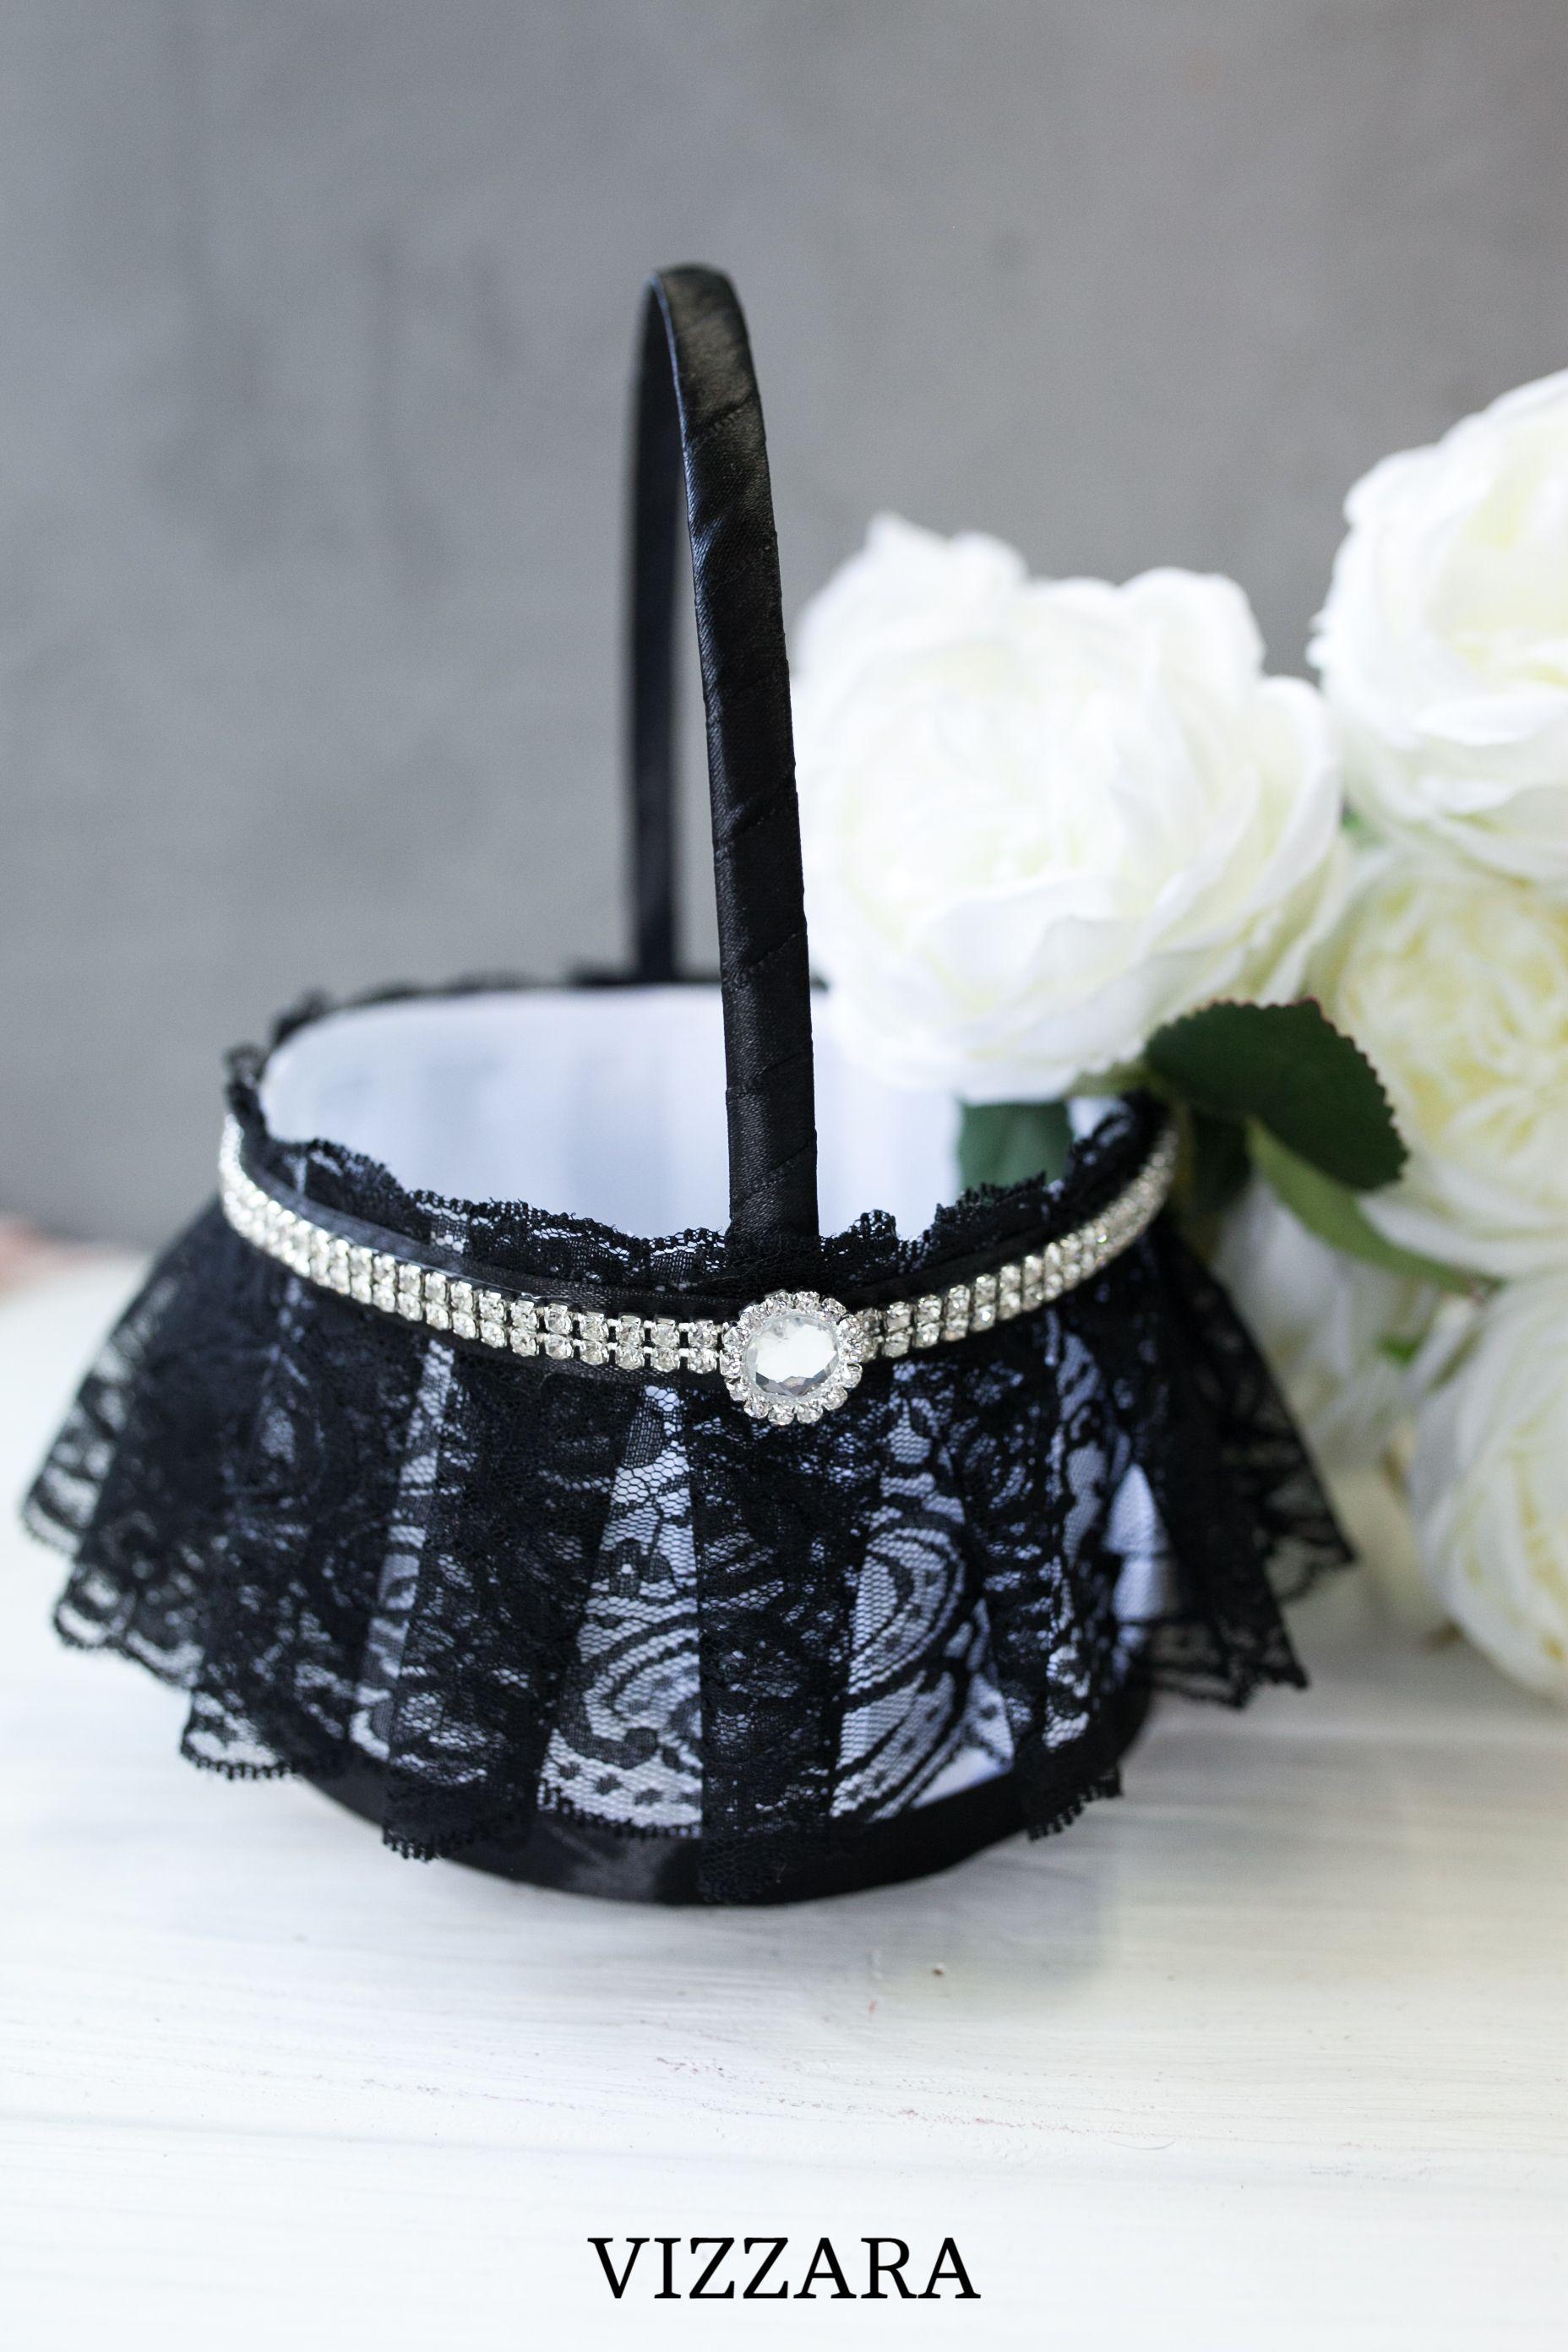 Flower girl baskets Black tie wedding Wedding basket Black tie optional wedding The black wedding Flower girl flower basket ideas Black